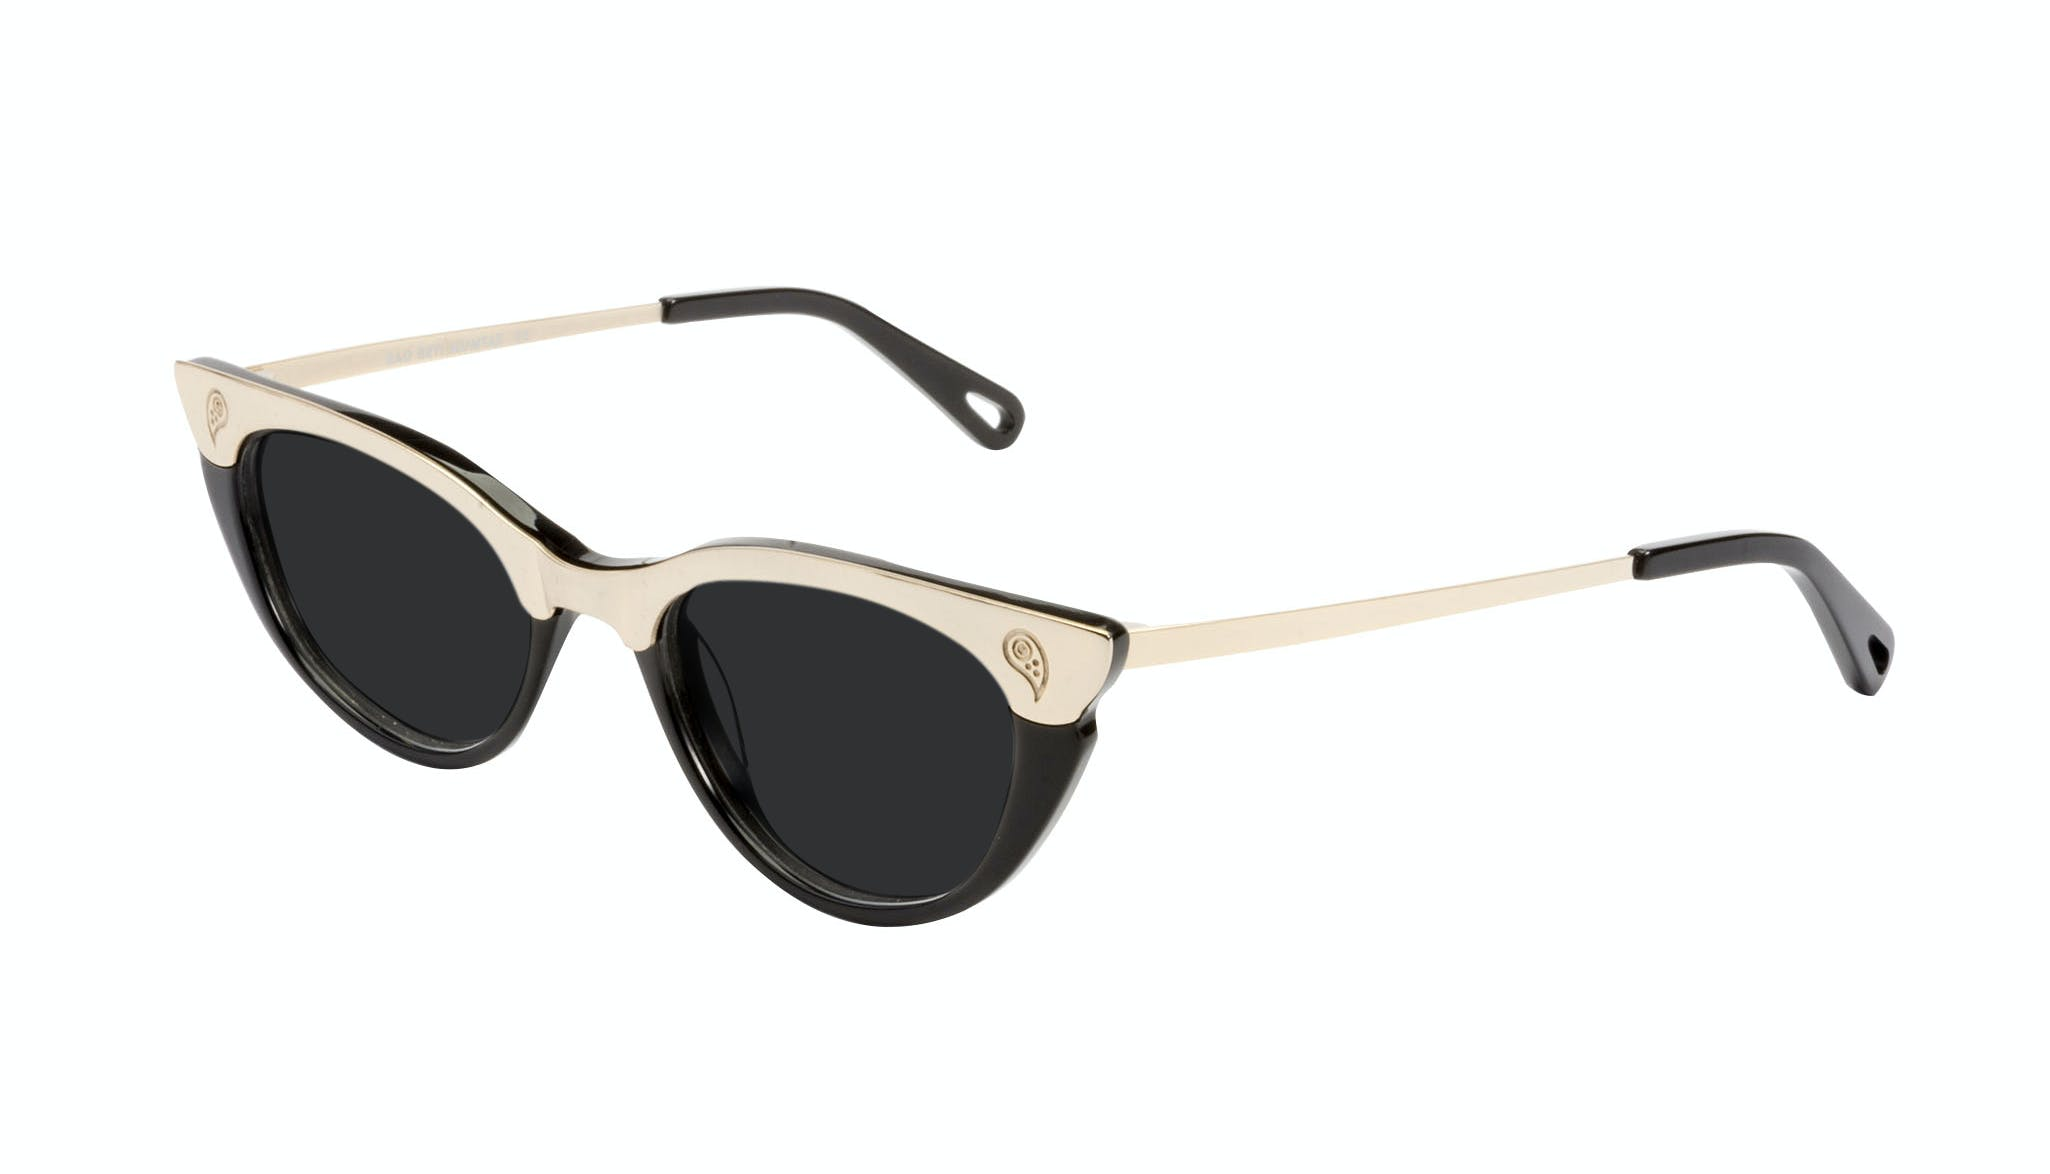 Affordable Fashion Glasses Cat Eye Daring Cateye Sunglasses Women Bad Beti Mumtaz Tilt